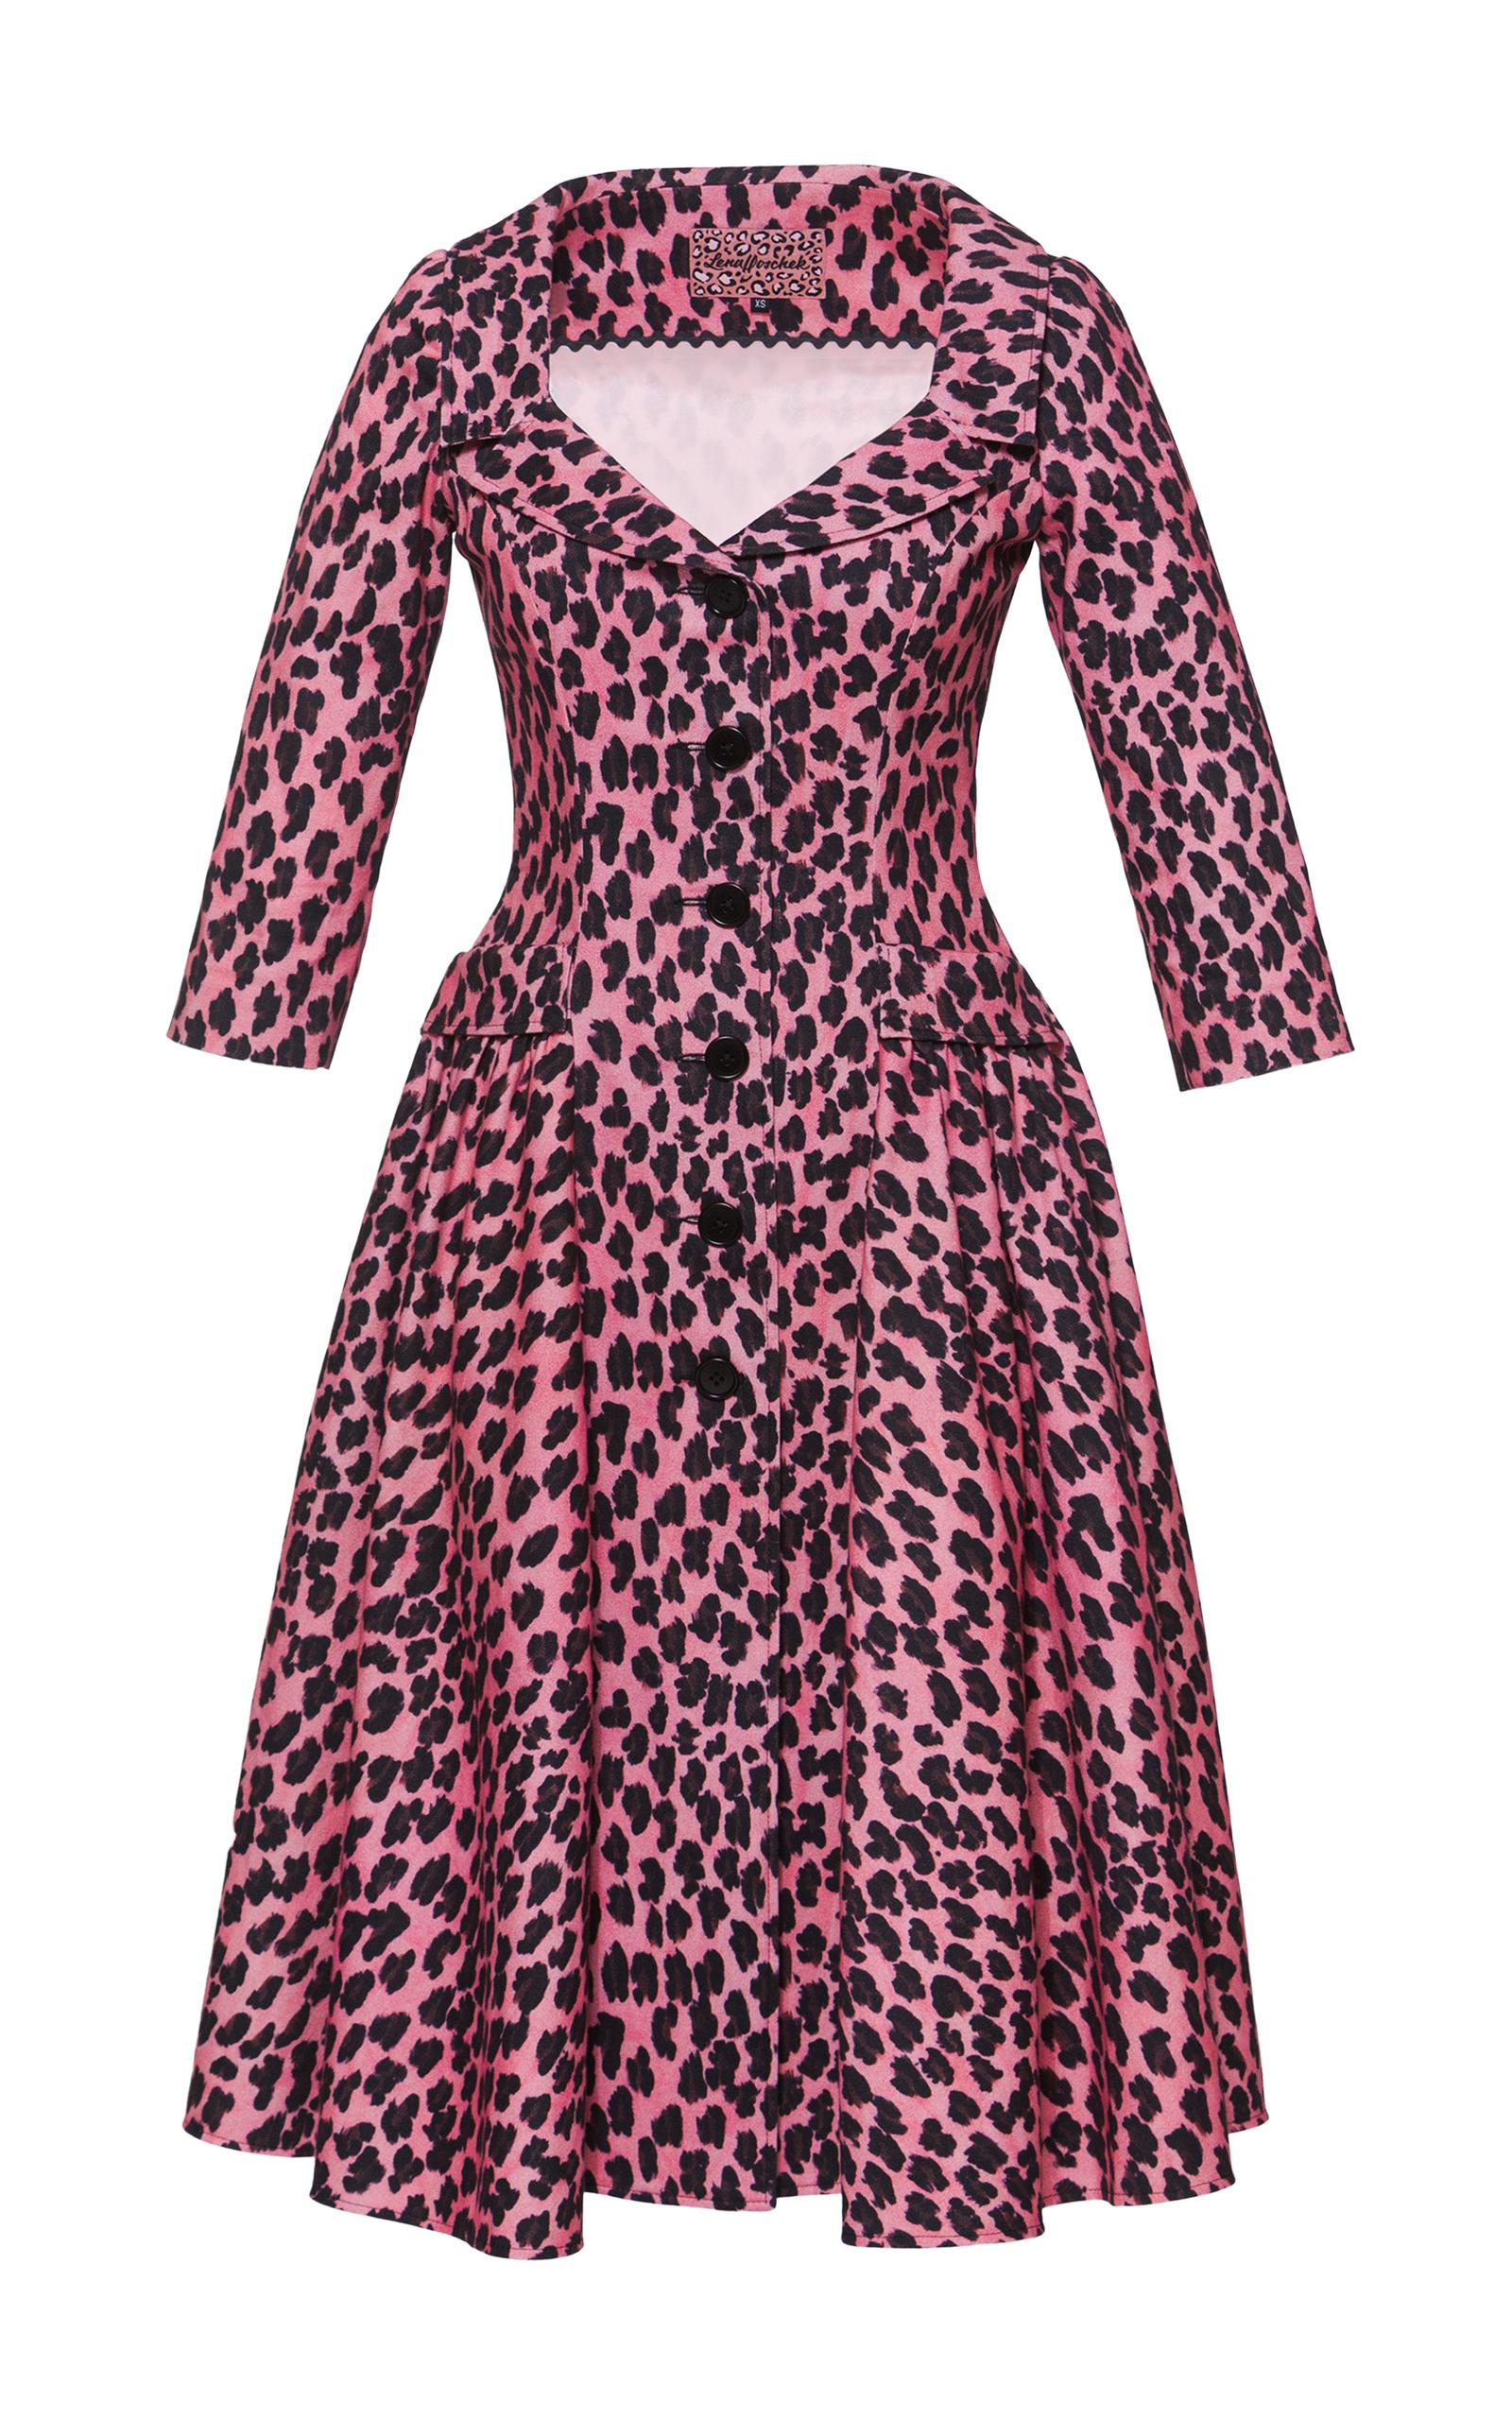 lena hoschek kitten collared dress in red lyst. Black Bedroom Furniture Sets. Home Design Ideas